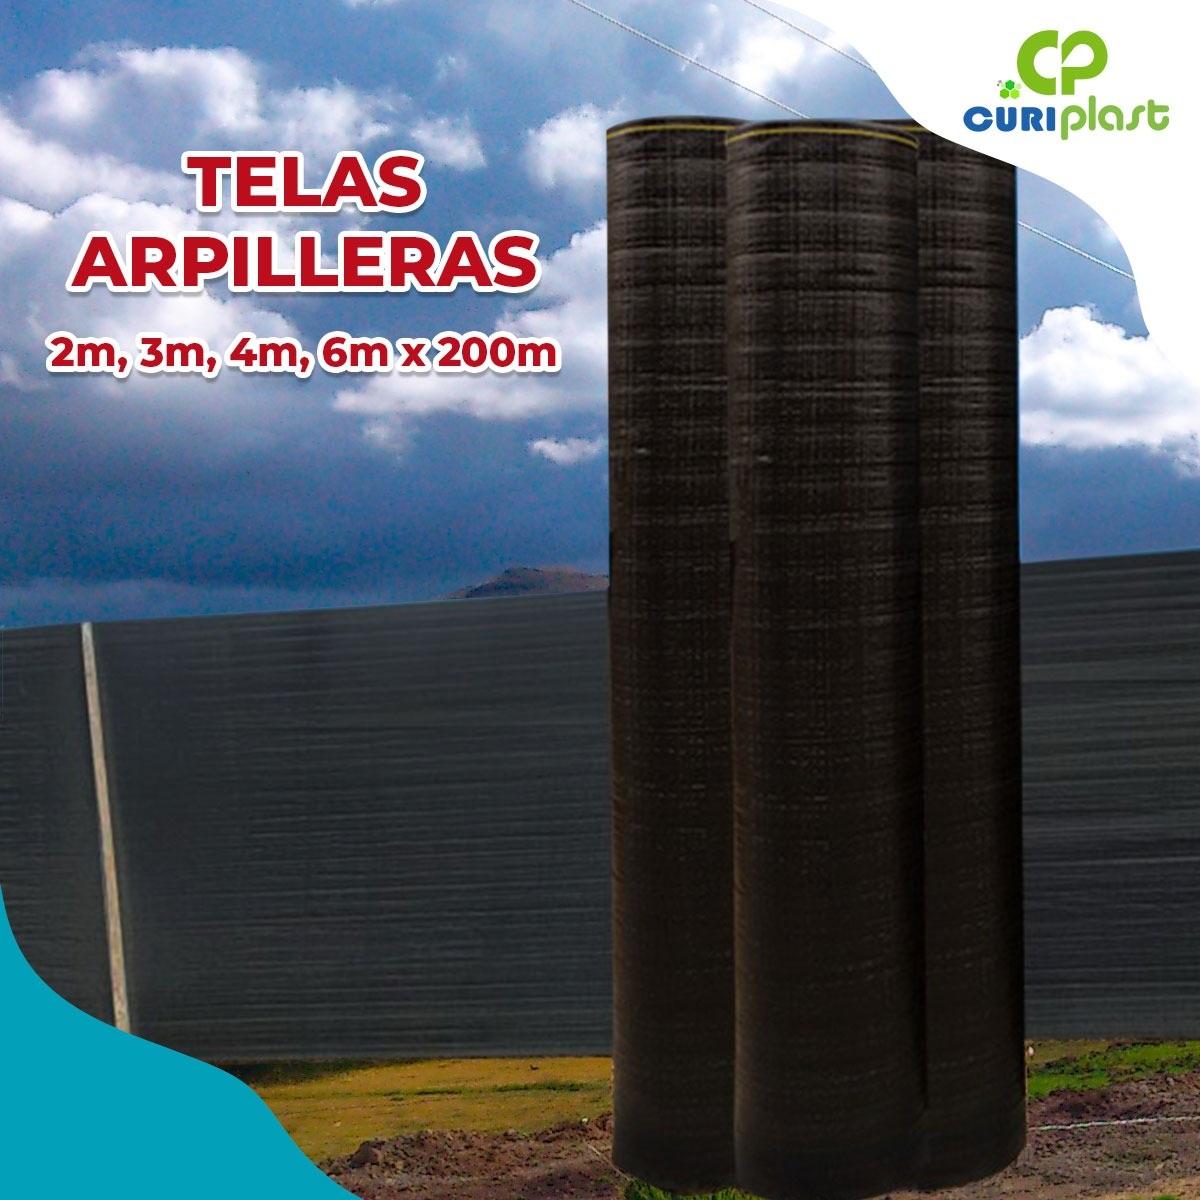 Telas Arpilleras, Laminadas, Tarflex